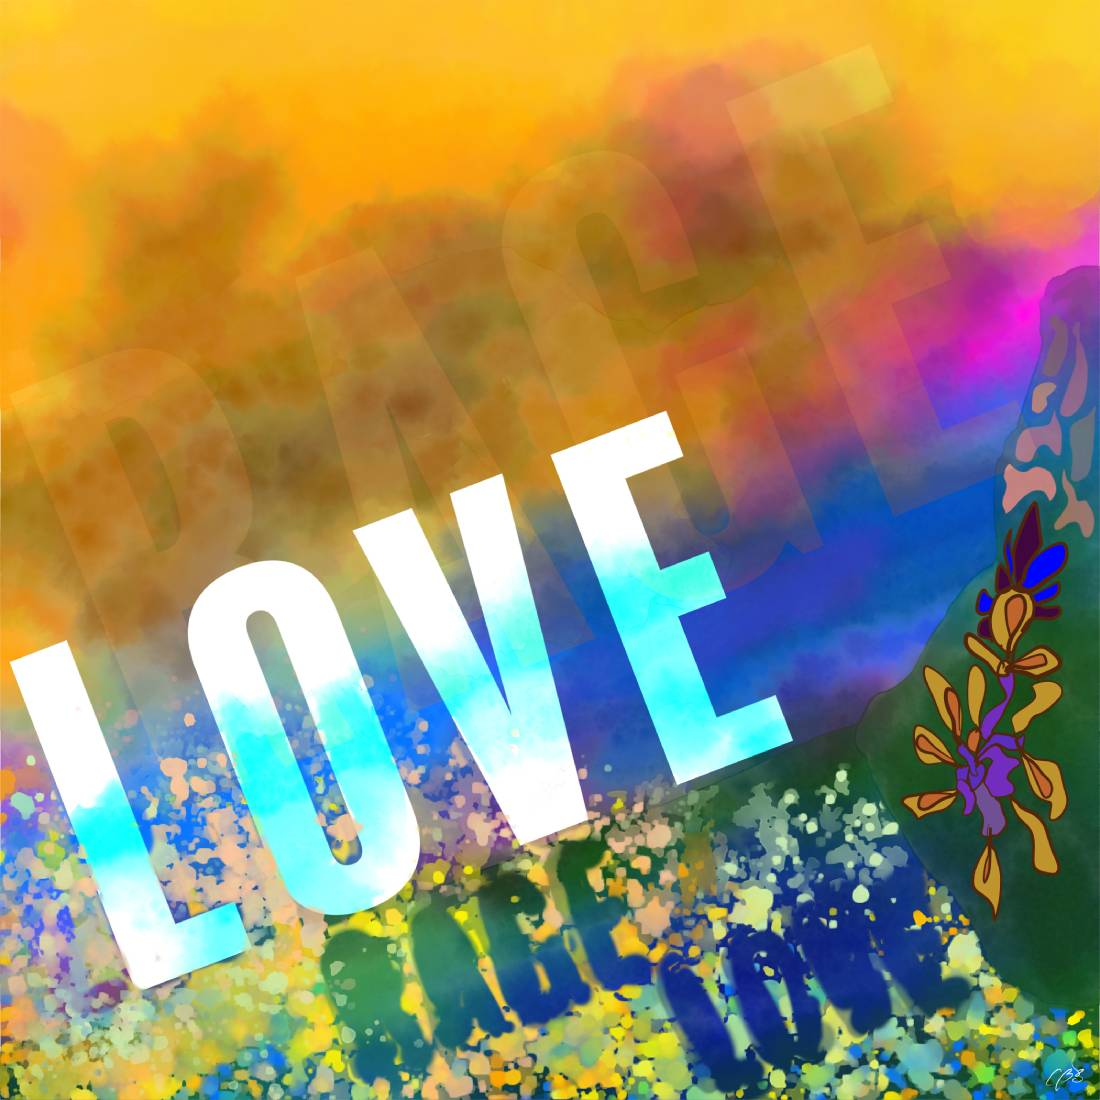 Love/Grief/Rage/Love, 2021, Digital Illustration